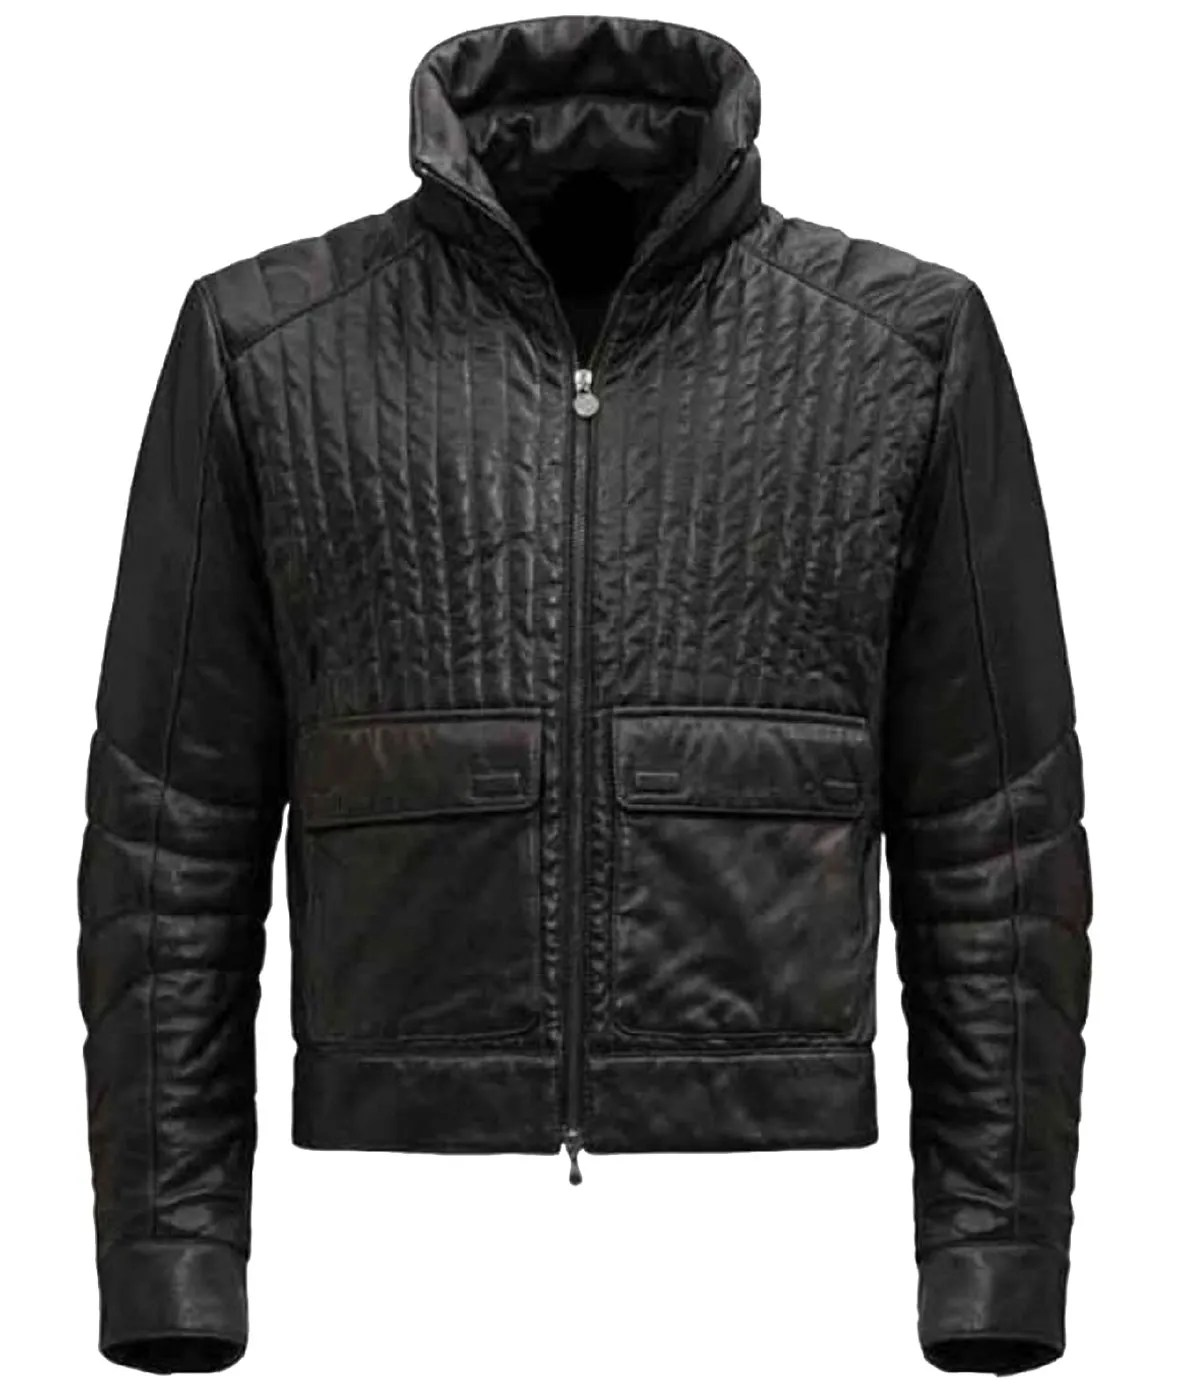 anakin-skywalker-jacket